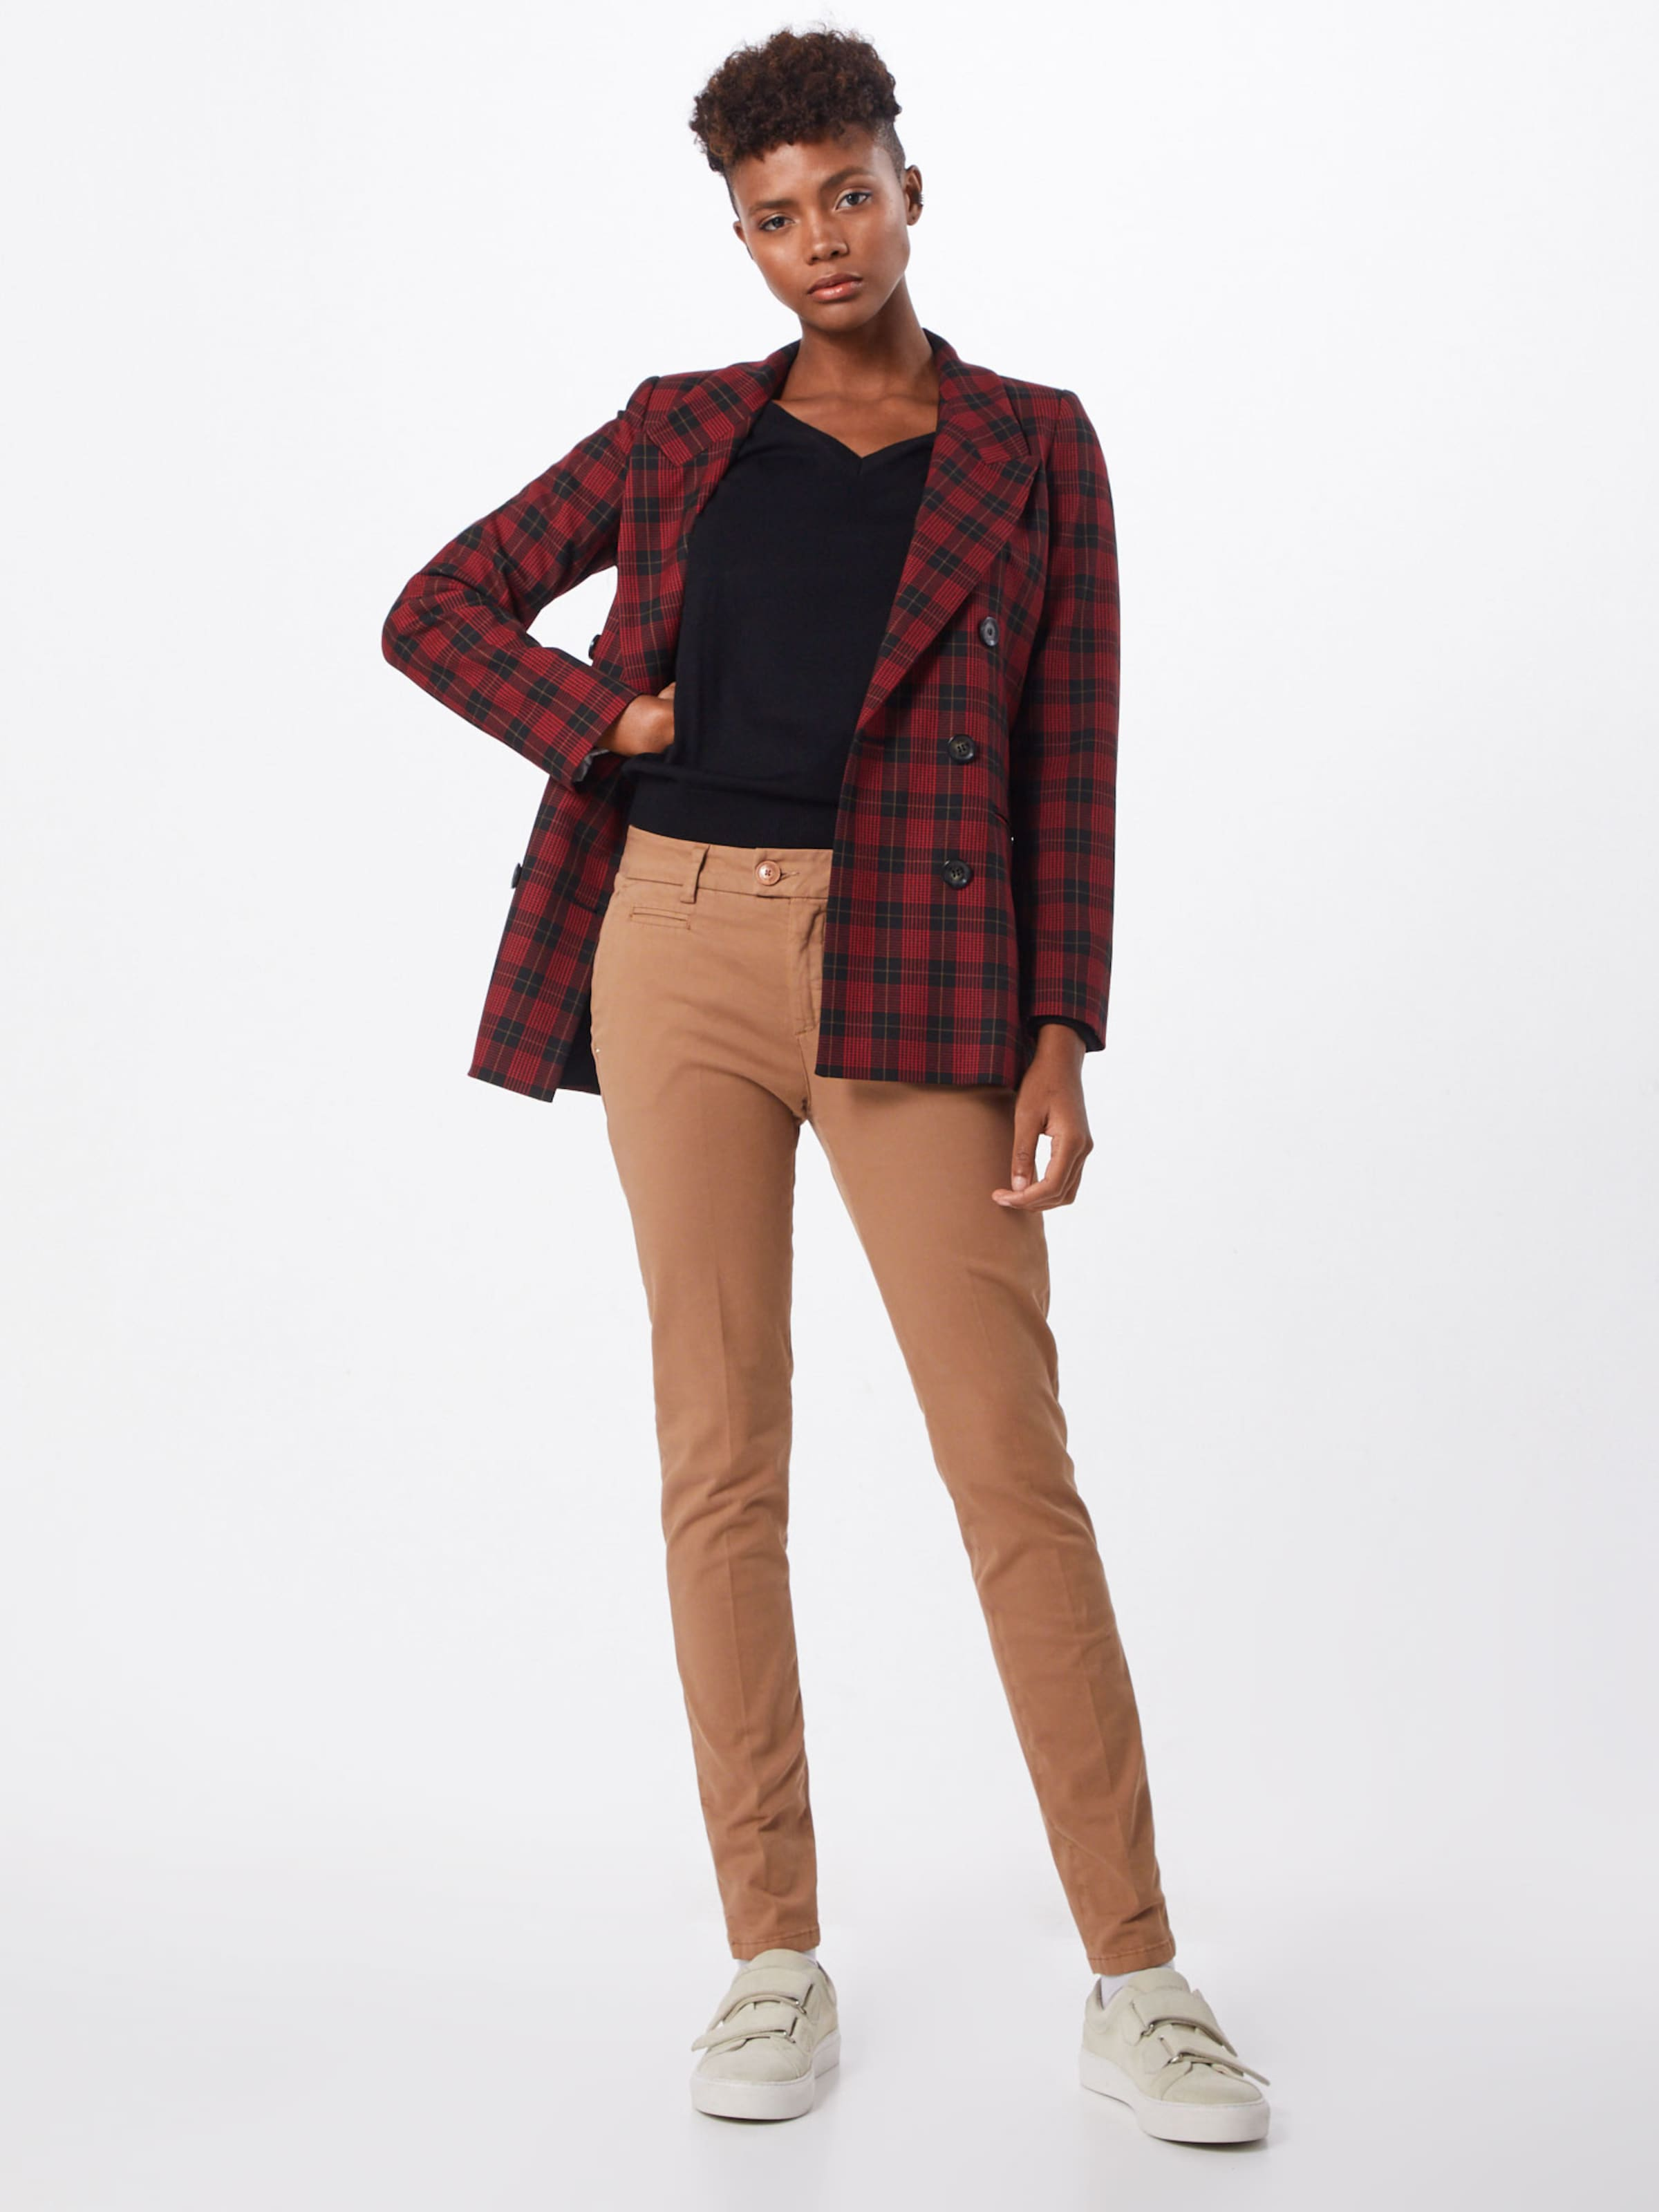 Schwarz Lacoste Pullover In 'tricot' Lacoste cqRLA4j35